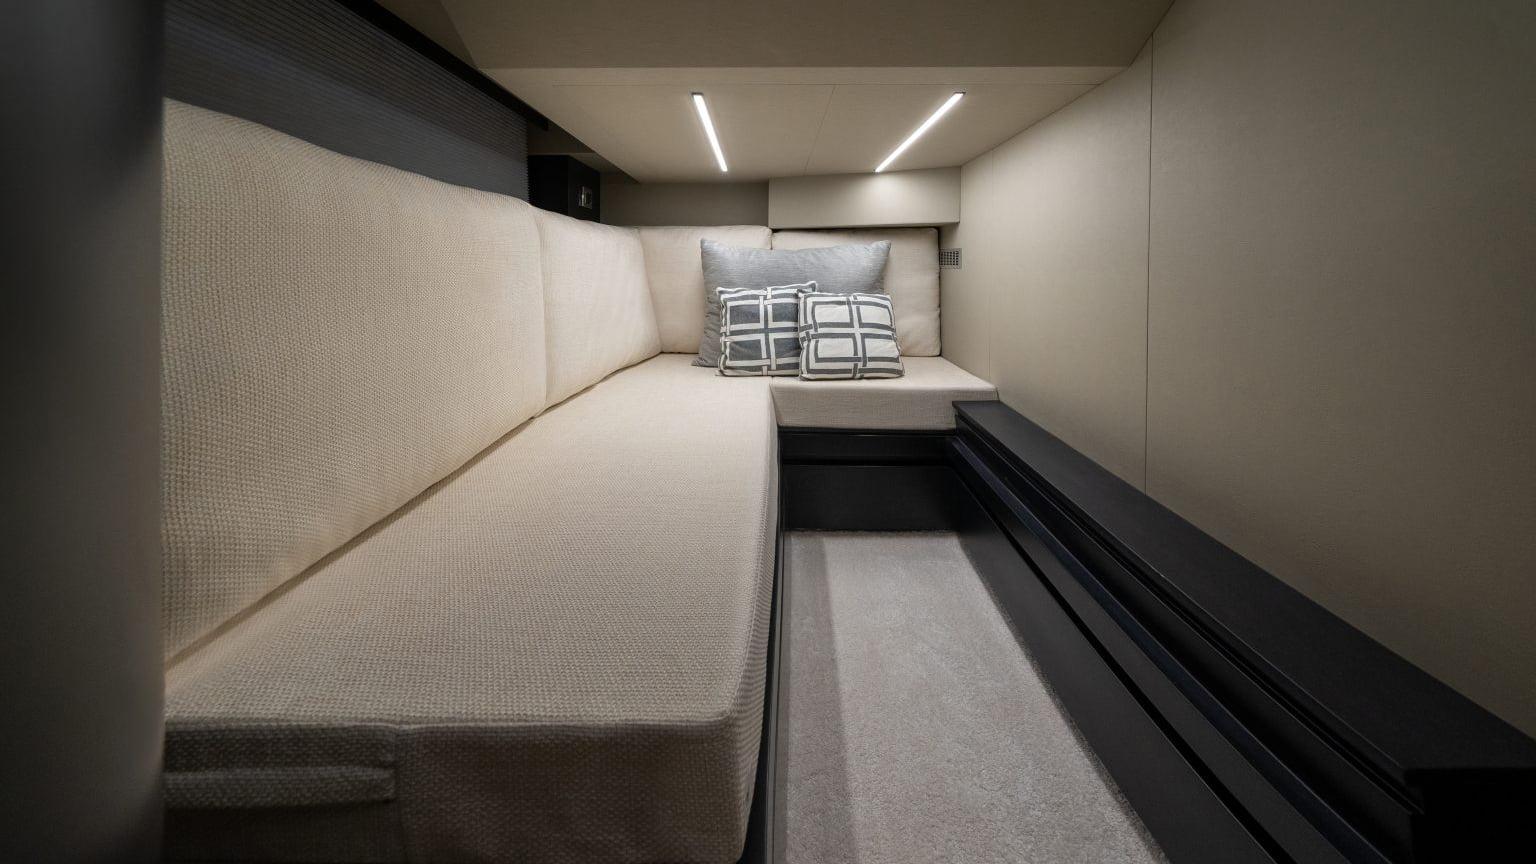 Okean 55 sport-ht - interiores (7)